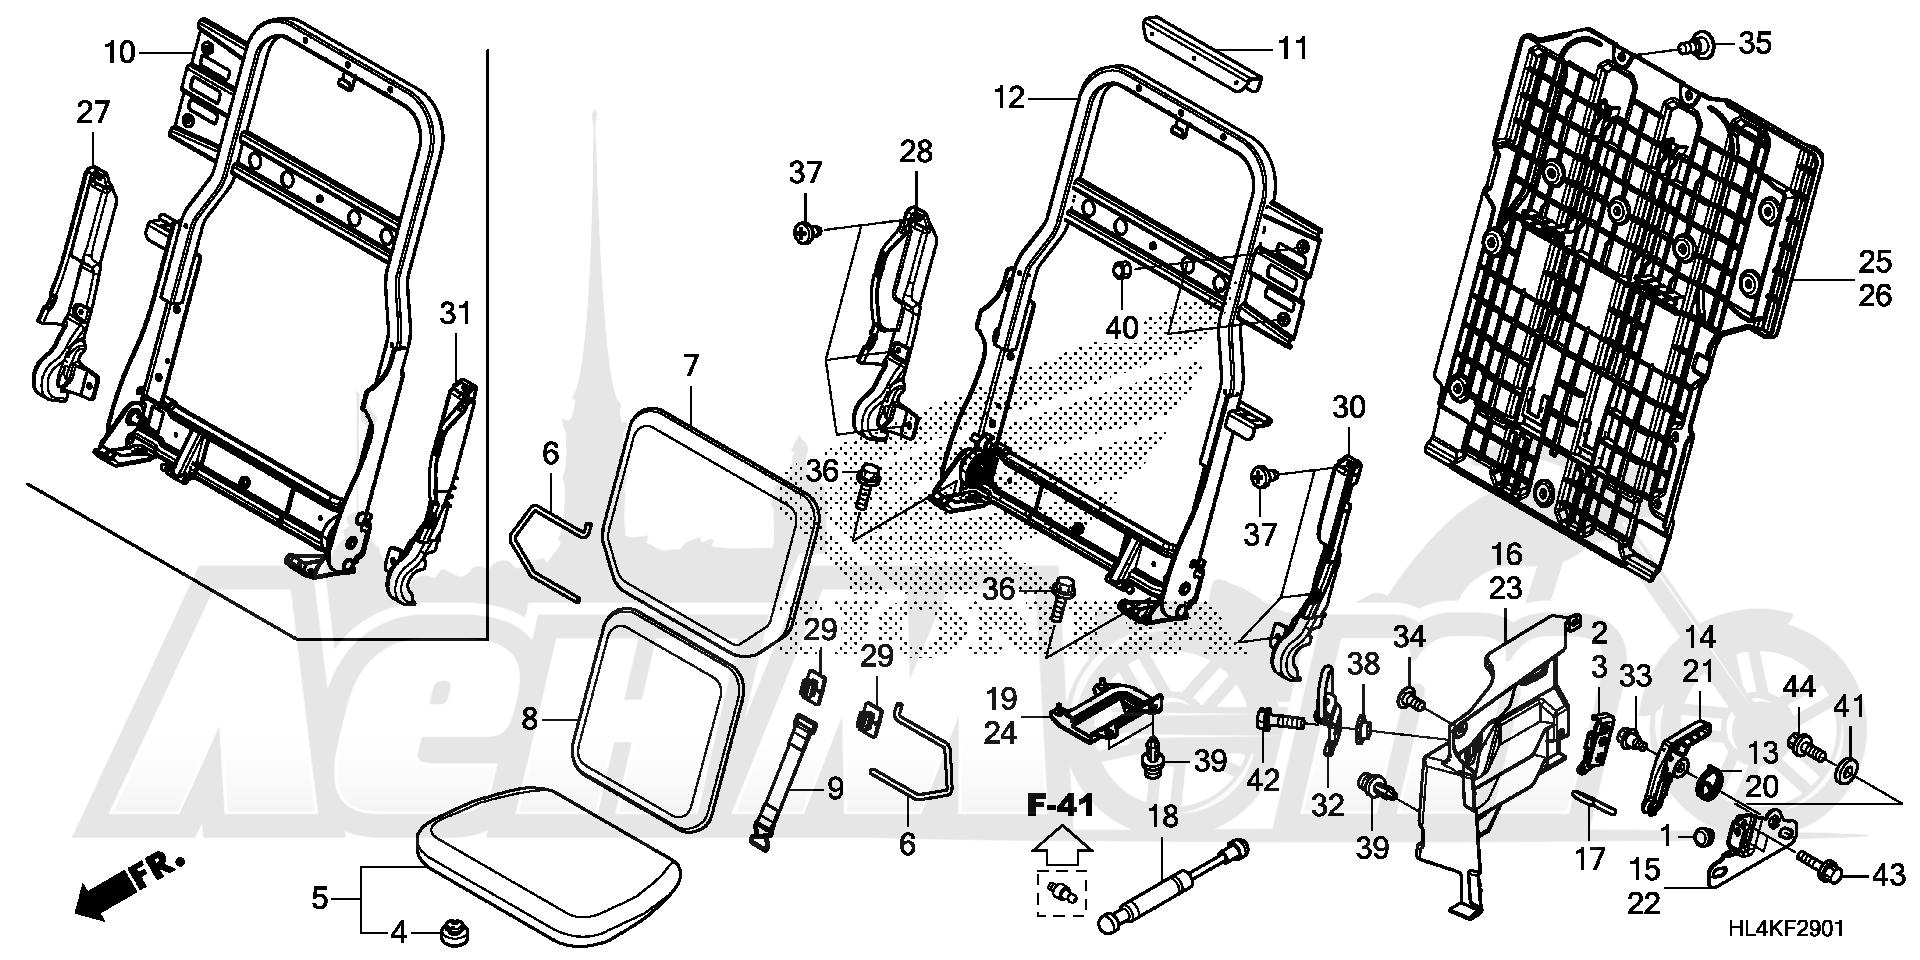 Запчасти для Квадроцикла Honda 2019 SXS1000M3P Раздел: REAR SEAT | зад сиденье